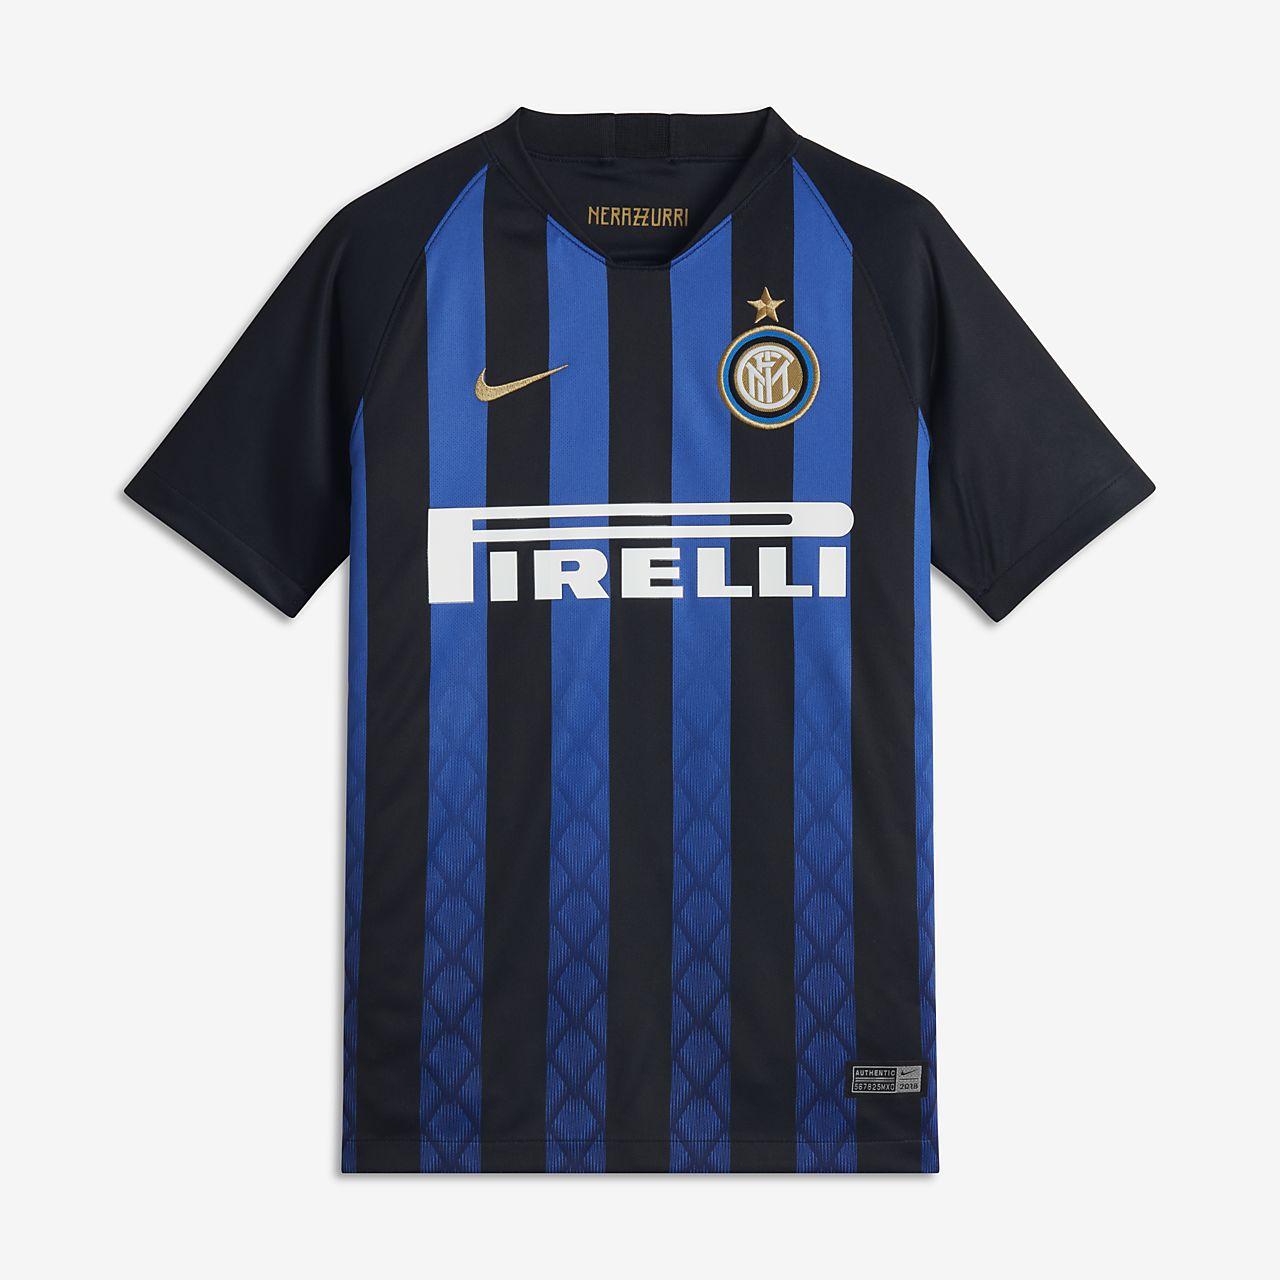 2018/19 Inter Milan Stadium Home Samarreta de futbol - Nen/a